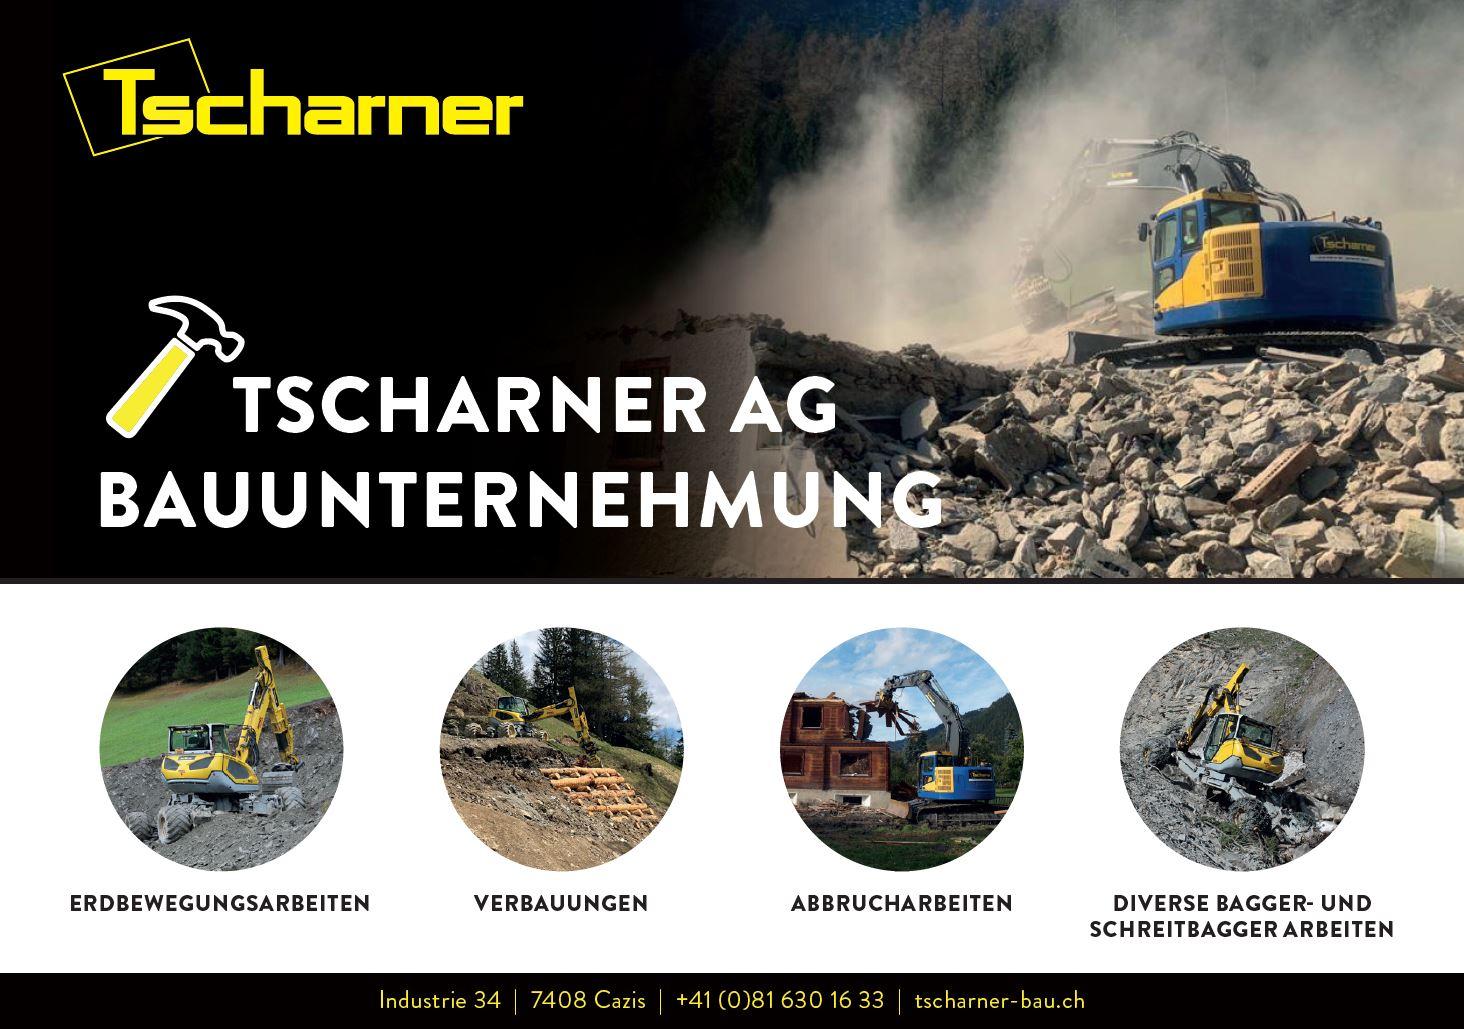 Tscharner AG, Bauunternehmung